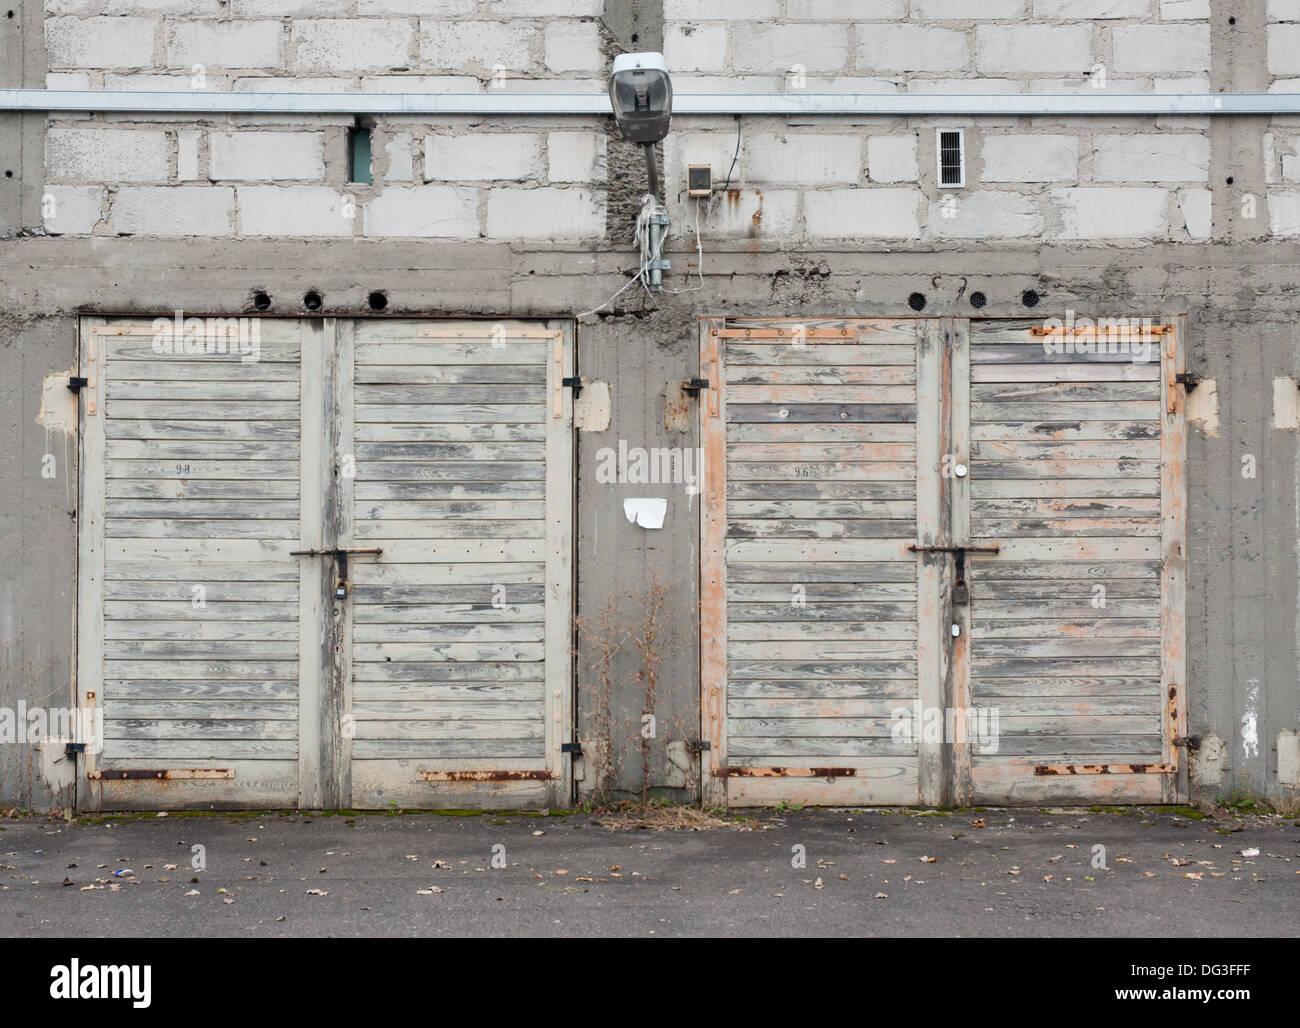 Set of old garage doors - Stock Image